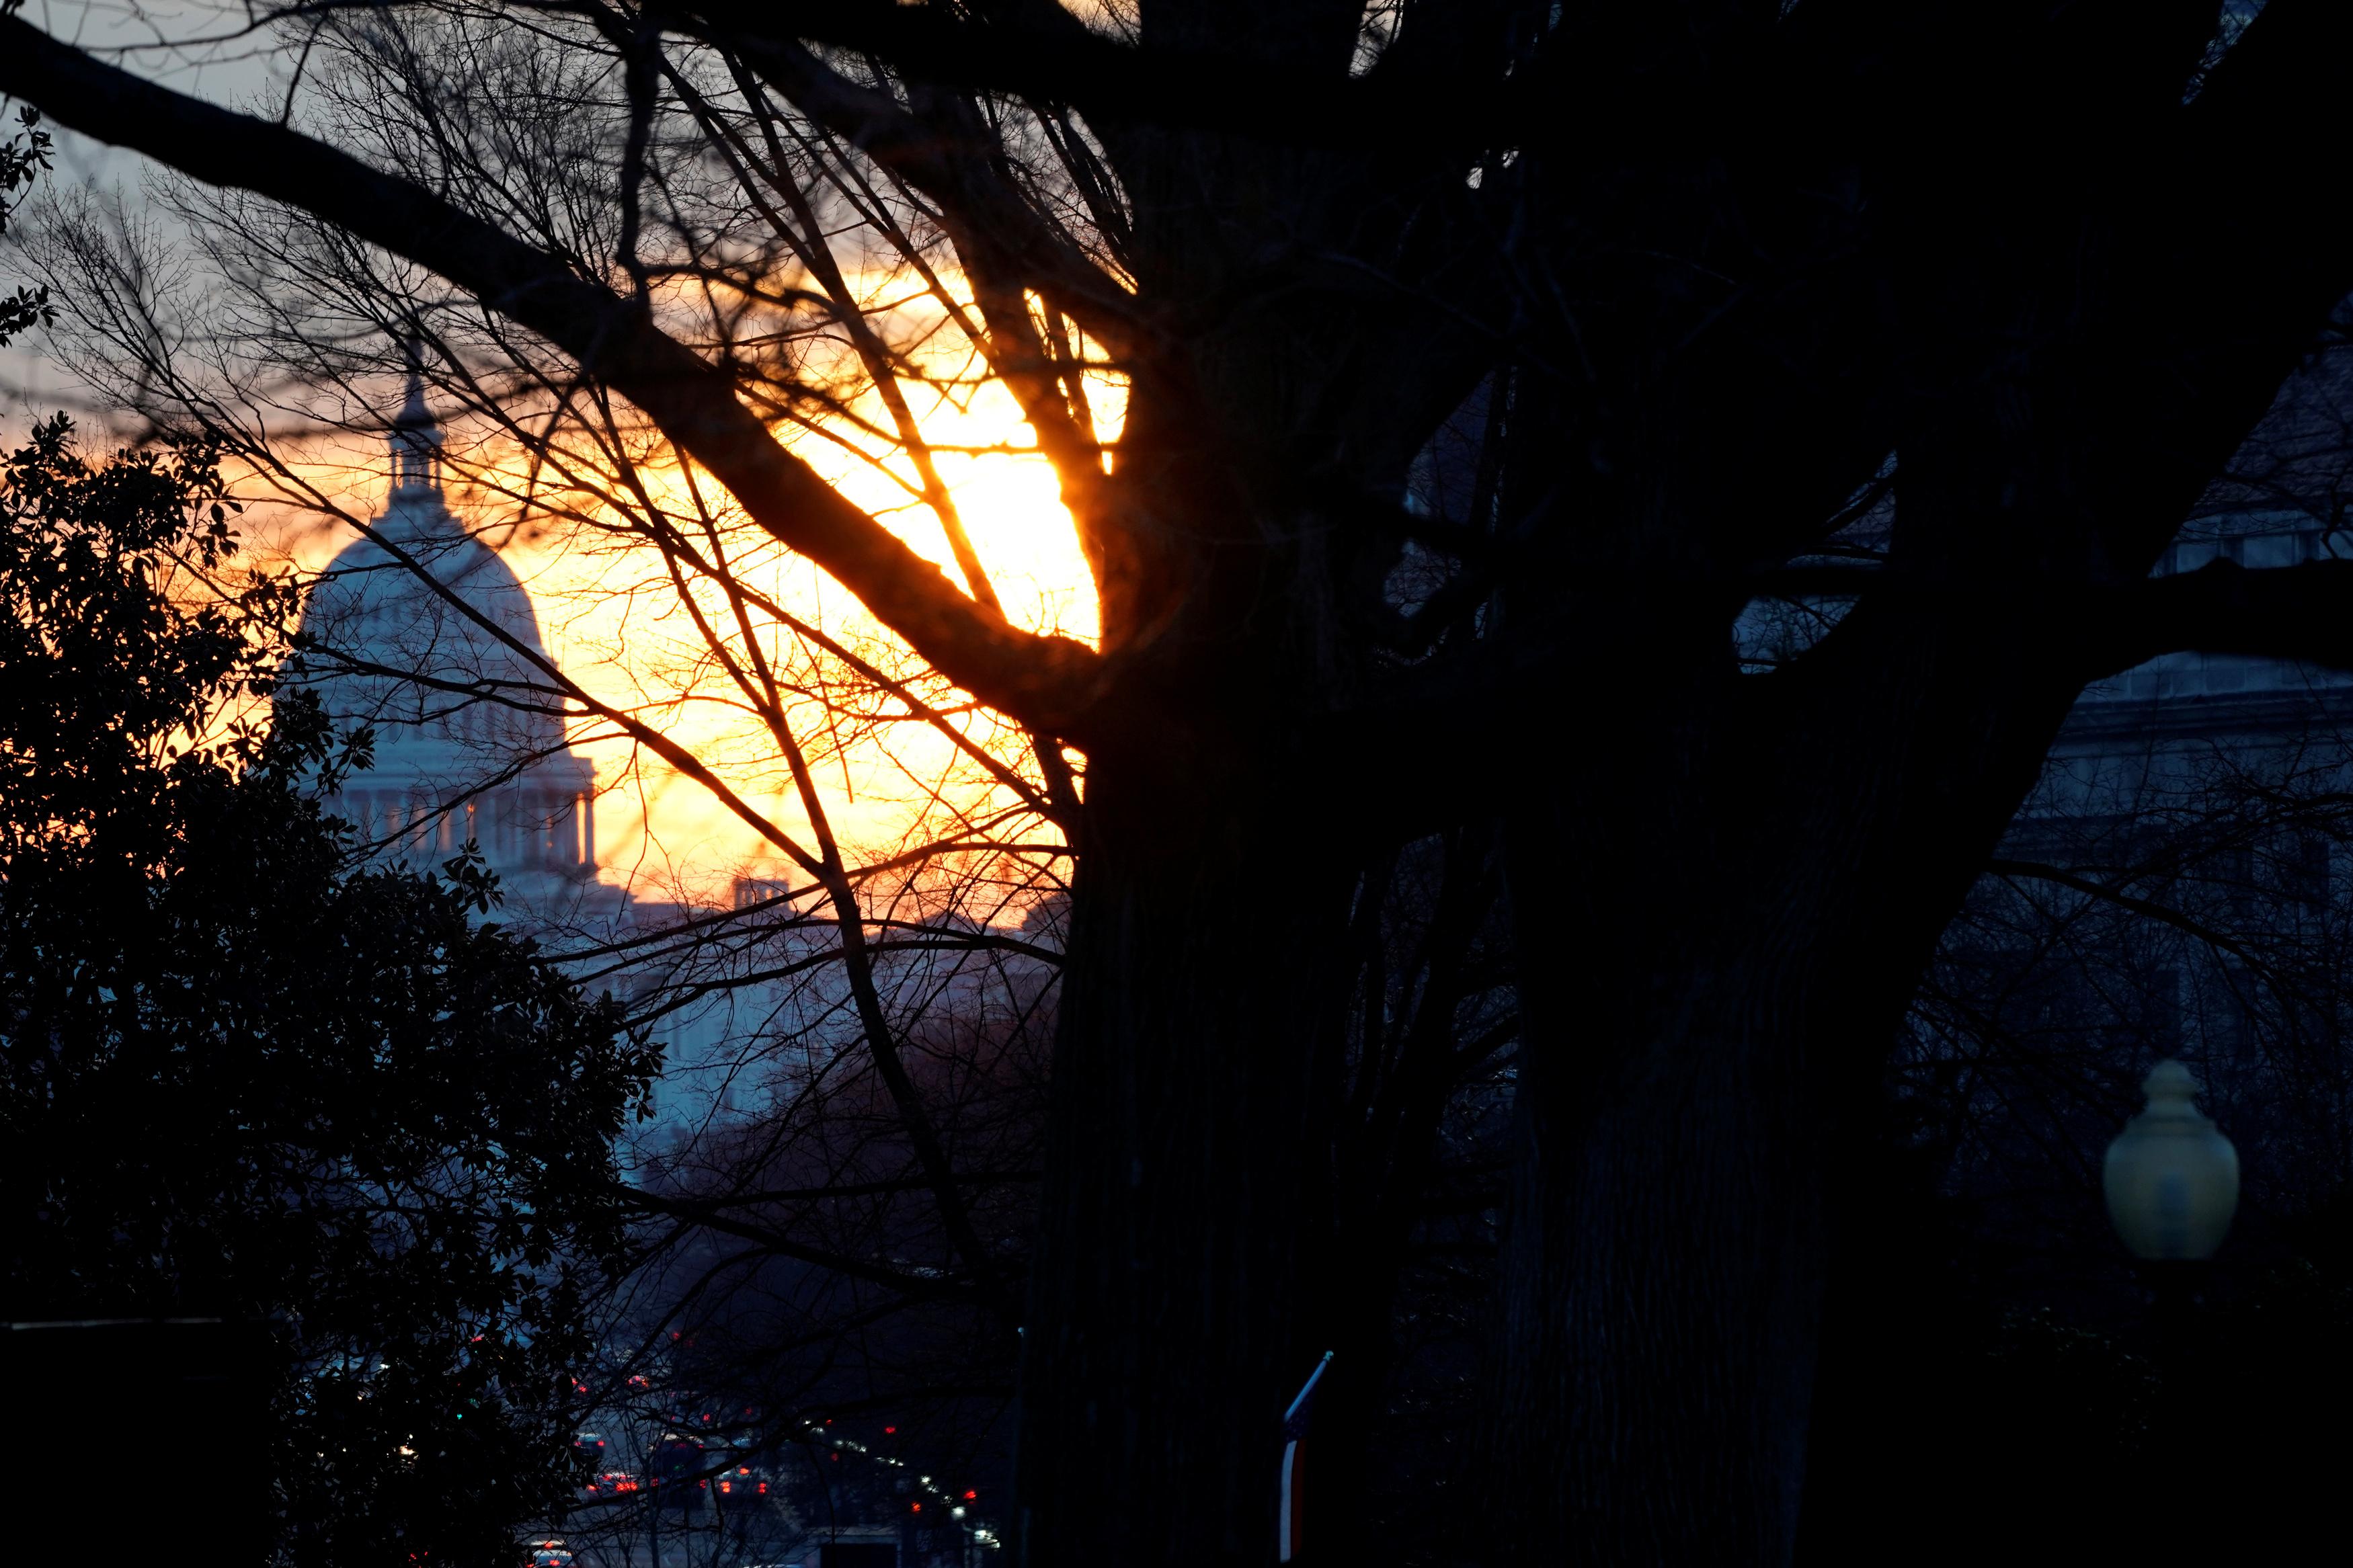 The sun rises over the U.S. Capitol.